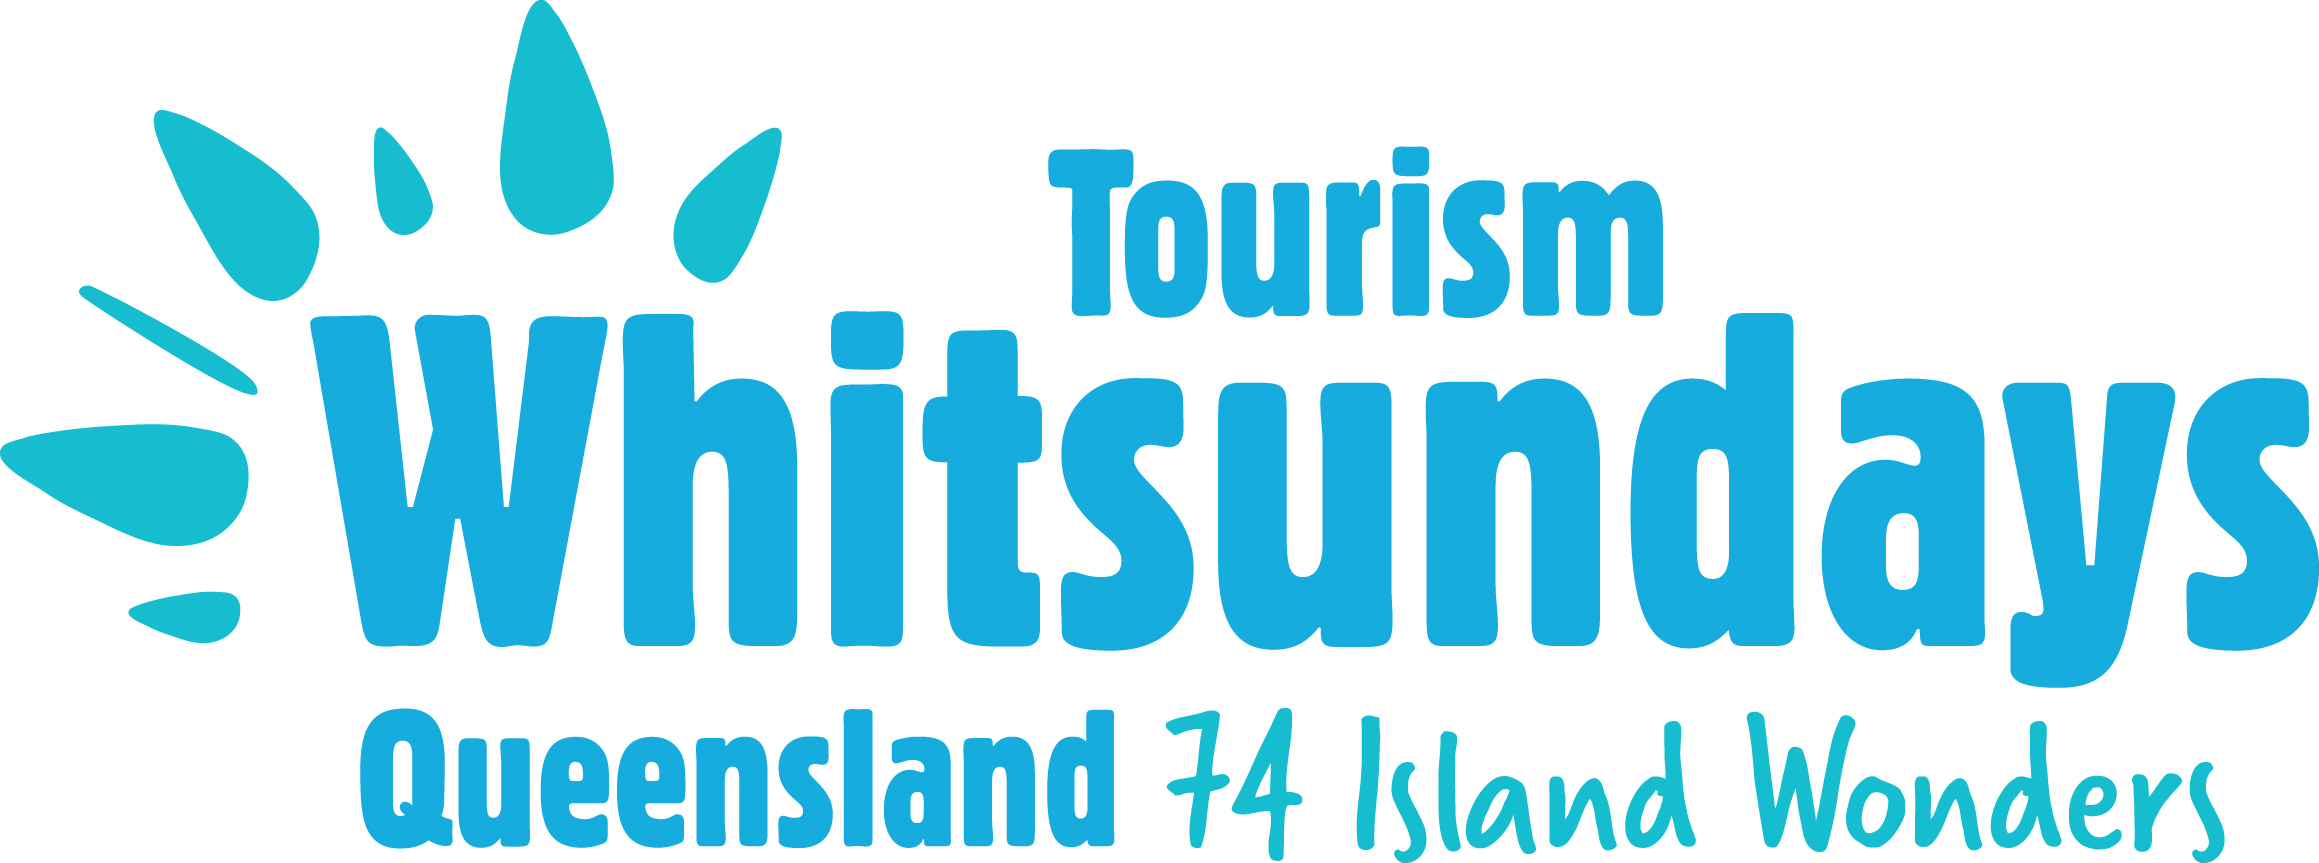 tourism whitsundays logo.jpg